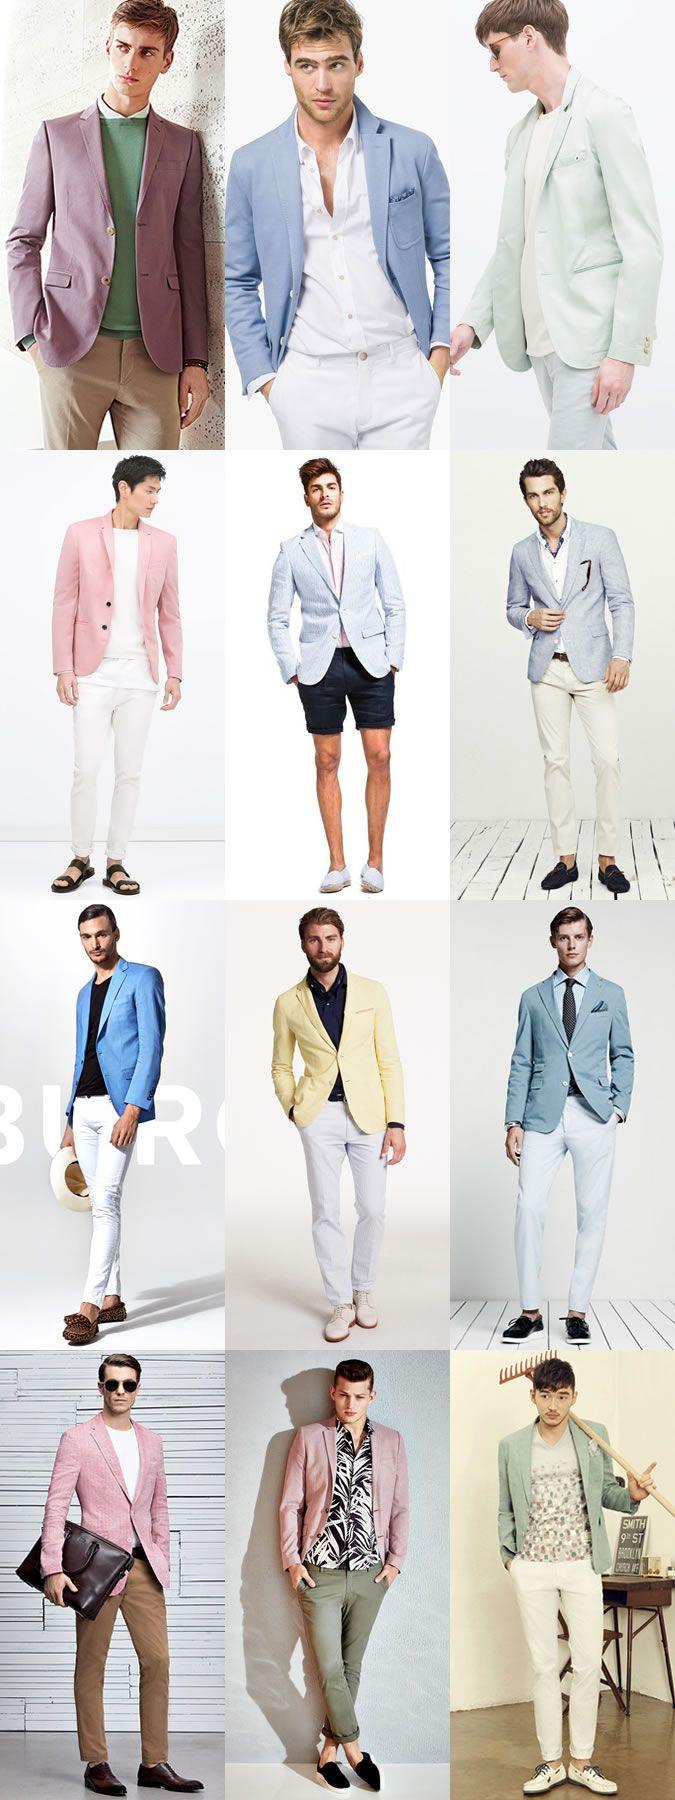 Key Mens Blazers for 2015 Spring/Summer: The Pastel Blazer Lookbook Inspiration